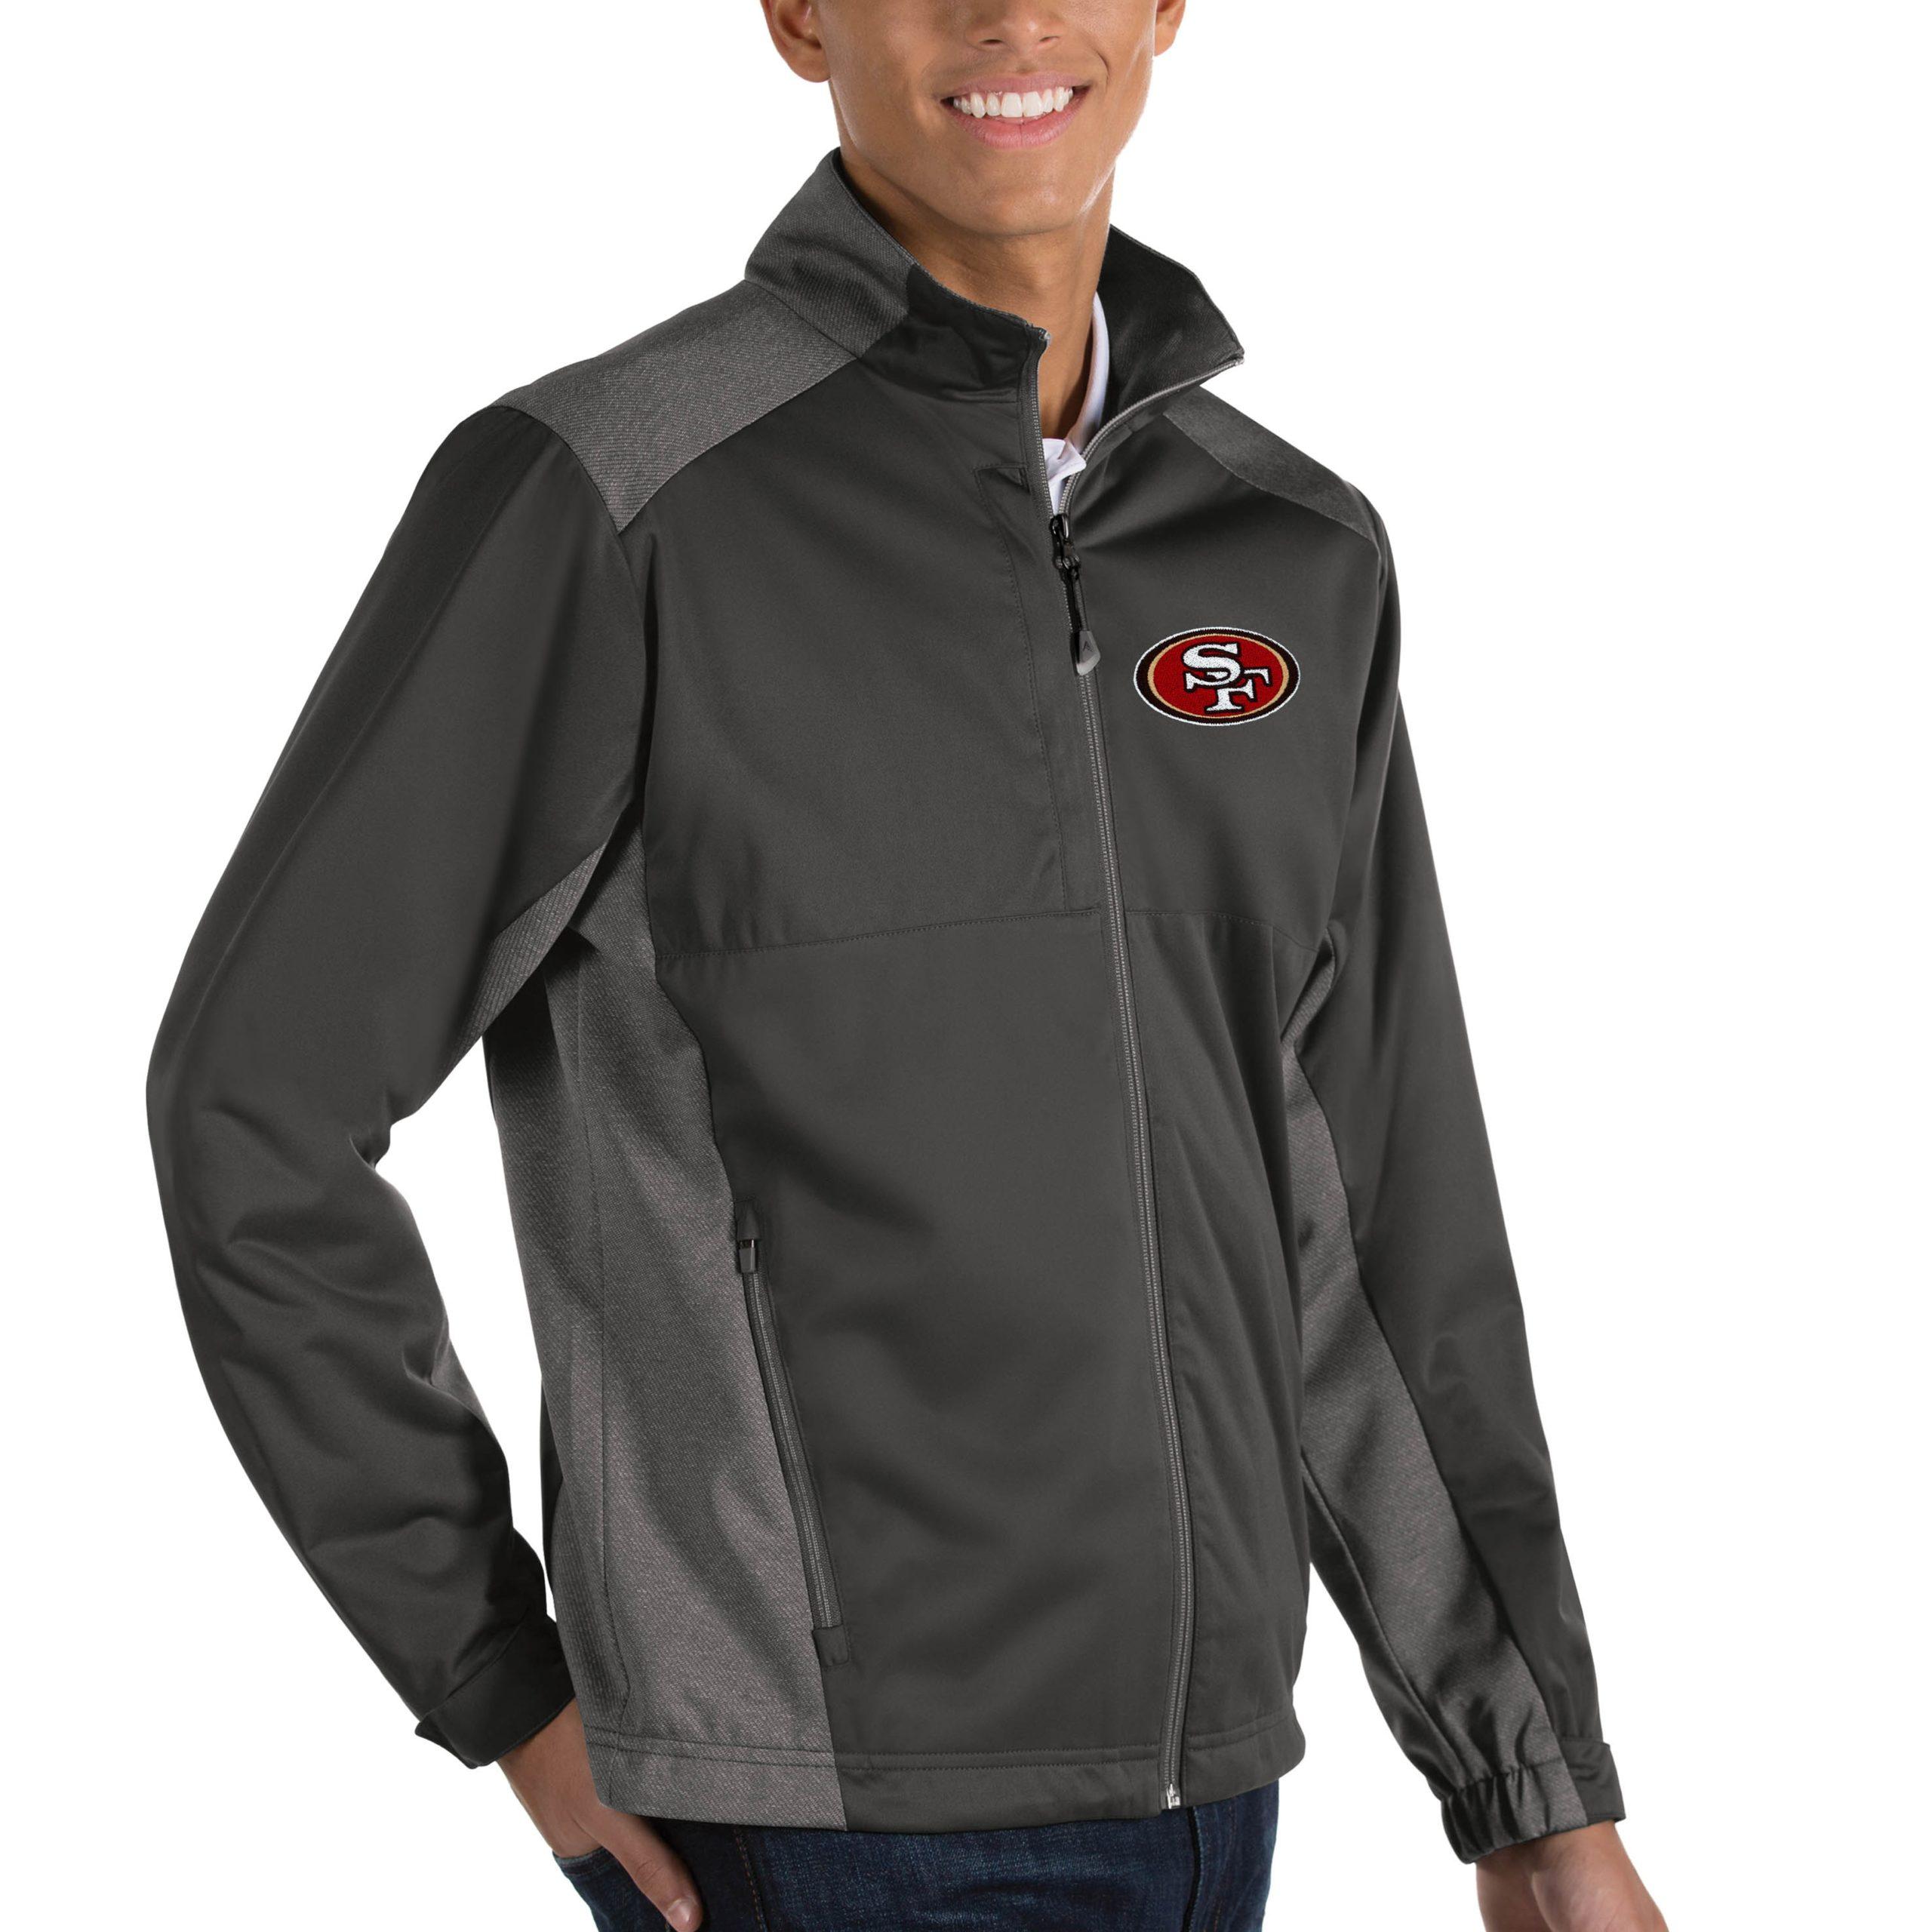 San Francisco 49ers Antigua Revolve Big & Tall Full-Zip Jacket - Heather Charcoal